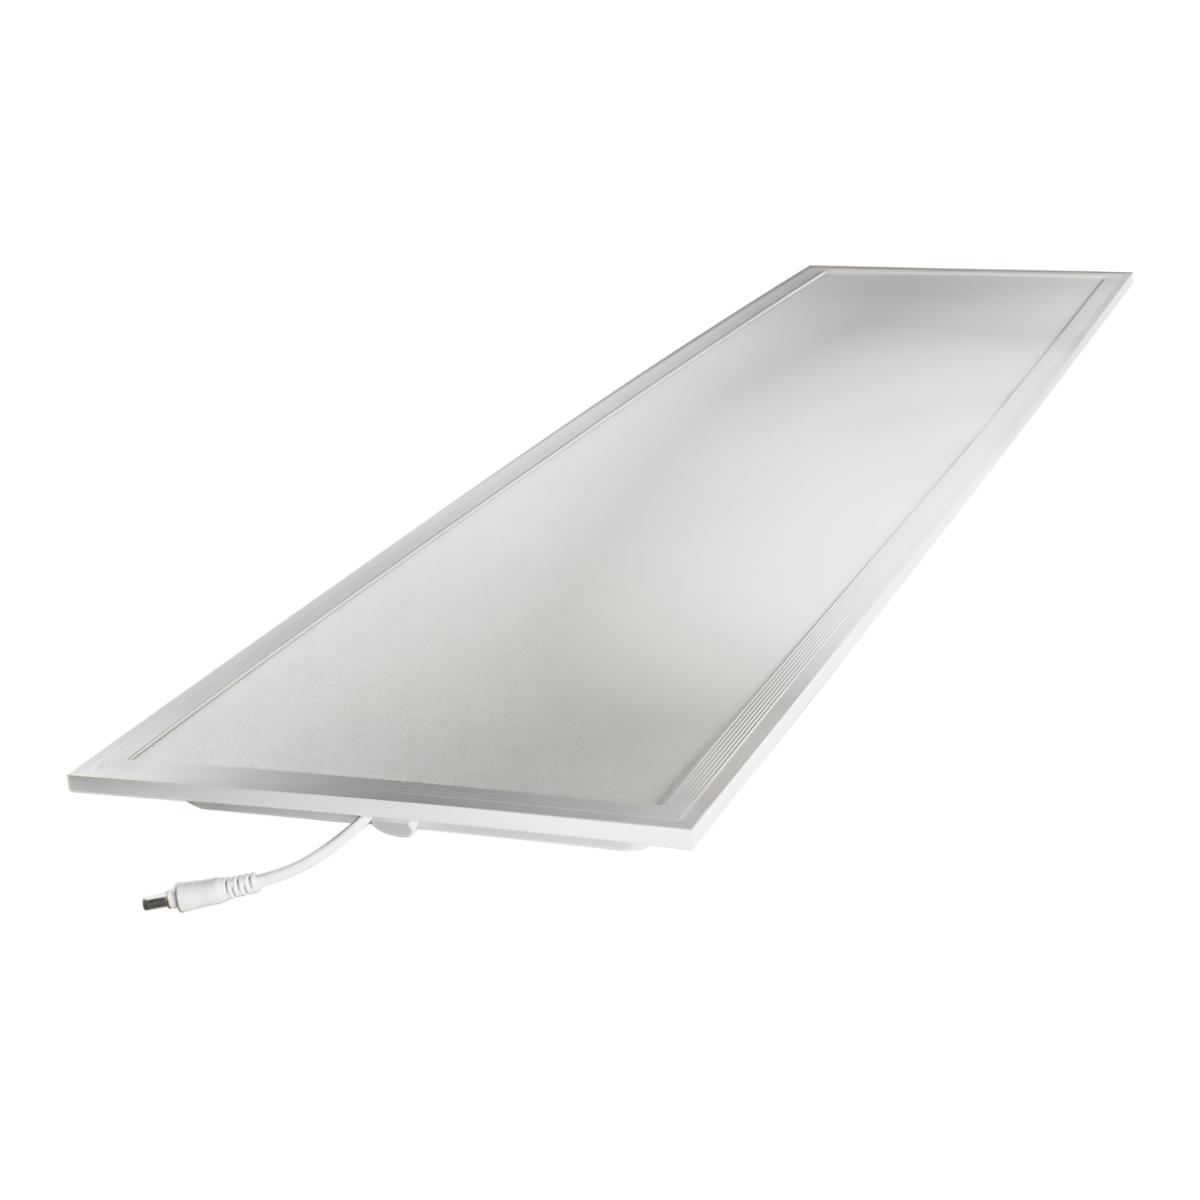 Noxion LED Paneel Delta Pro Highlum V2.0 Xitanium DALI 40W 30x120cm 6500K 5480lm UGR <19 | Dali Dimbaar - Vervanger voor 2x36W